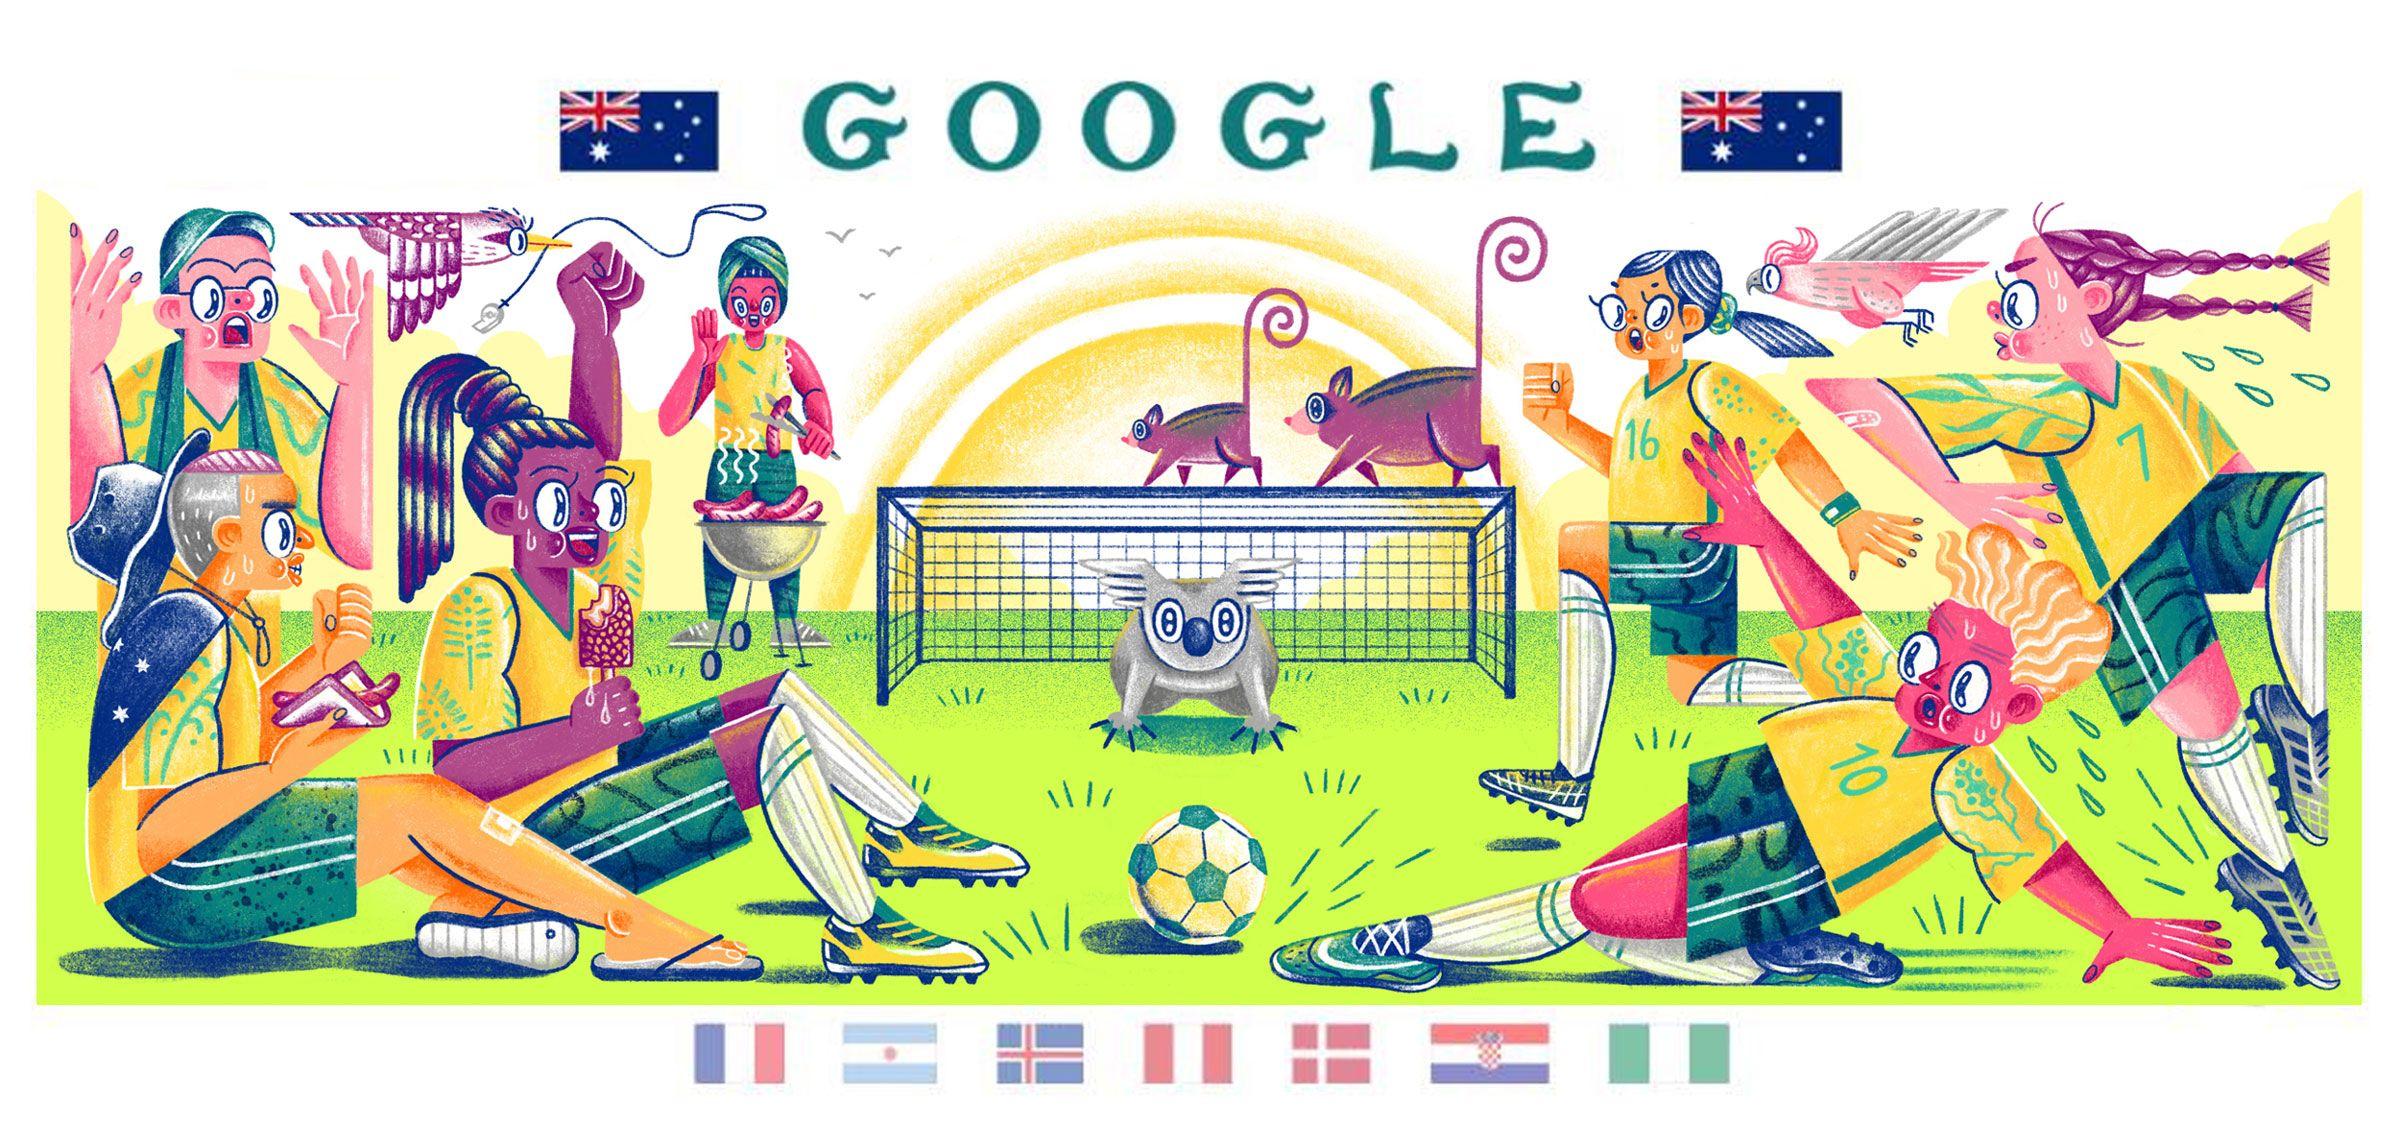 Soccer Illustration For Google By Helen Li Google Doodles Google Doodle Today Fifa Tournaments